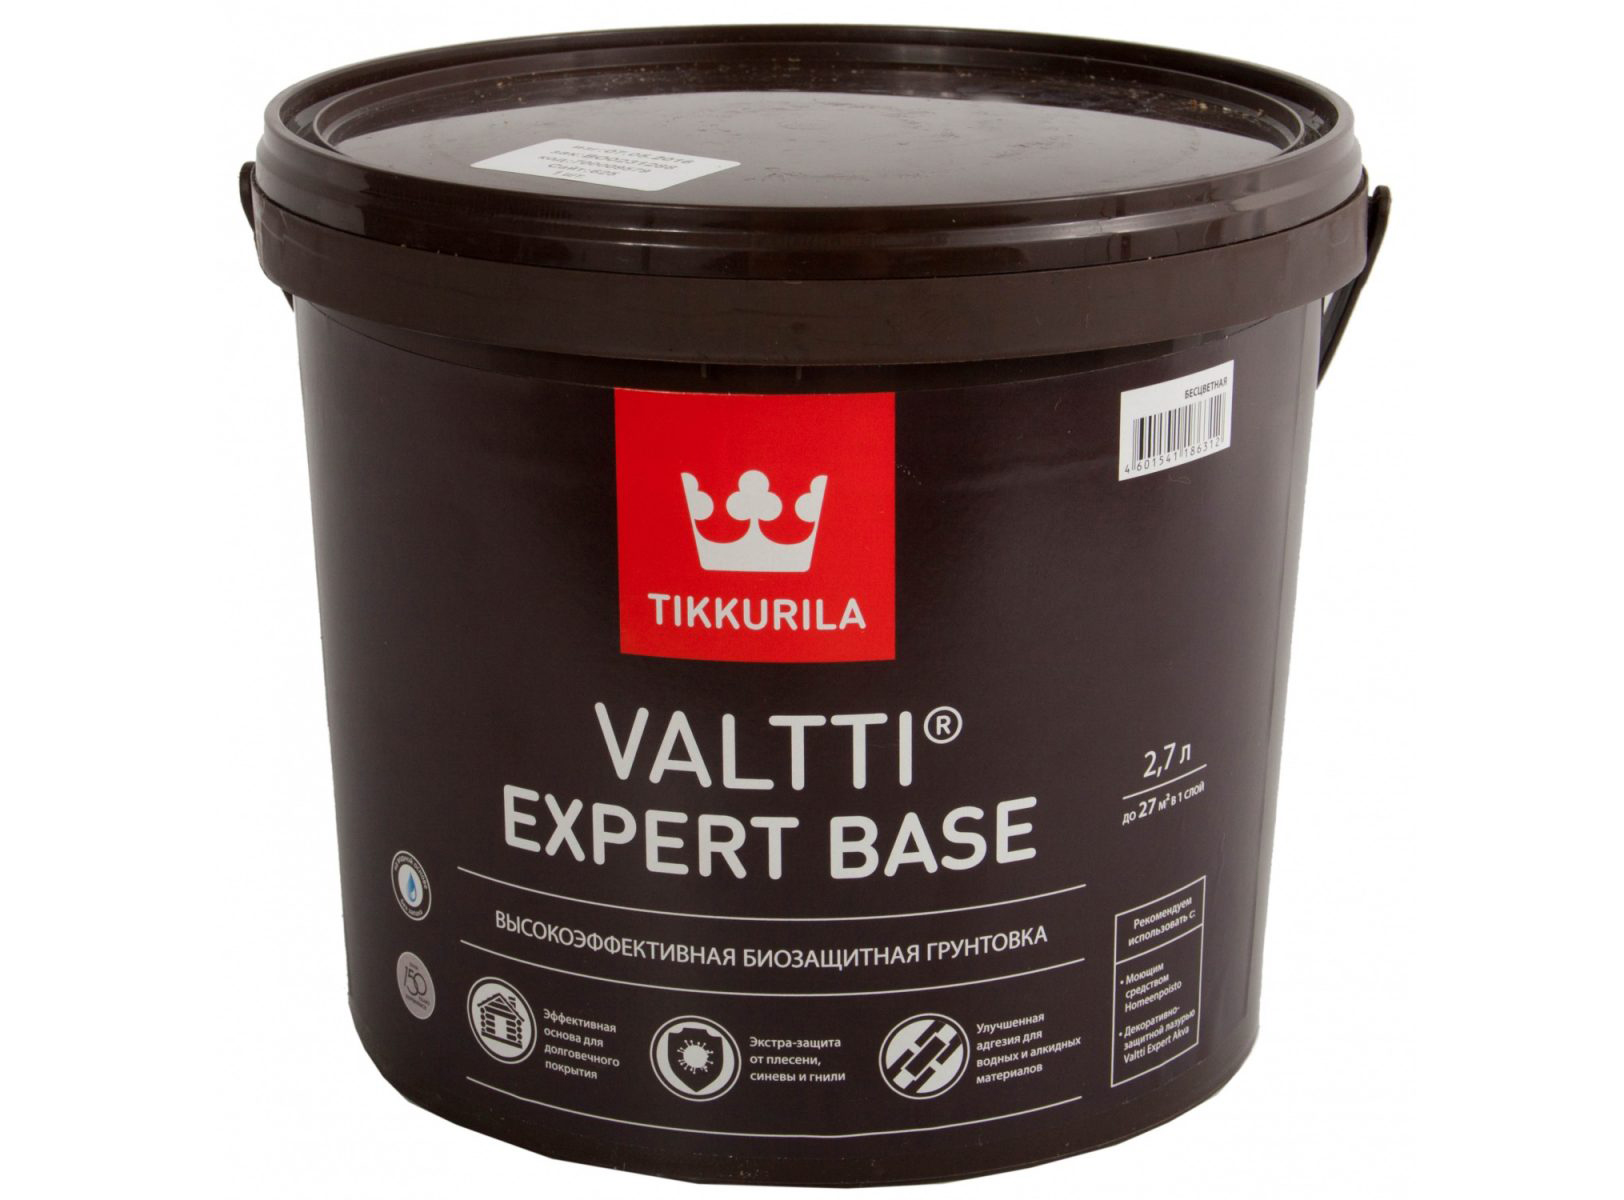 Тиккурила Valtti Expert Base